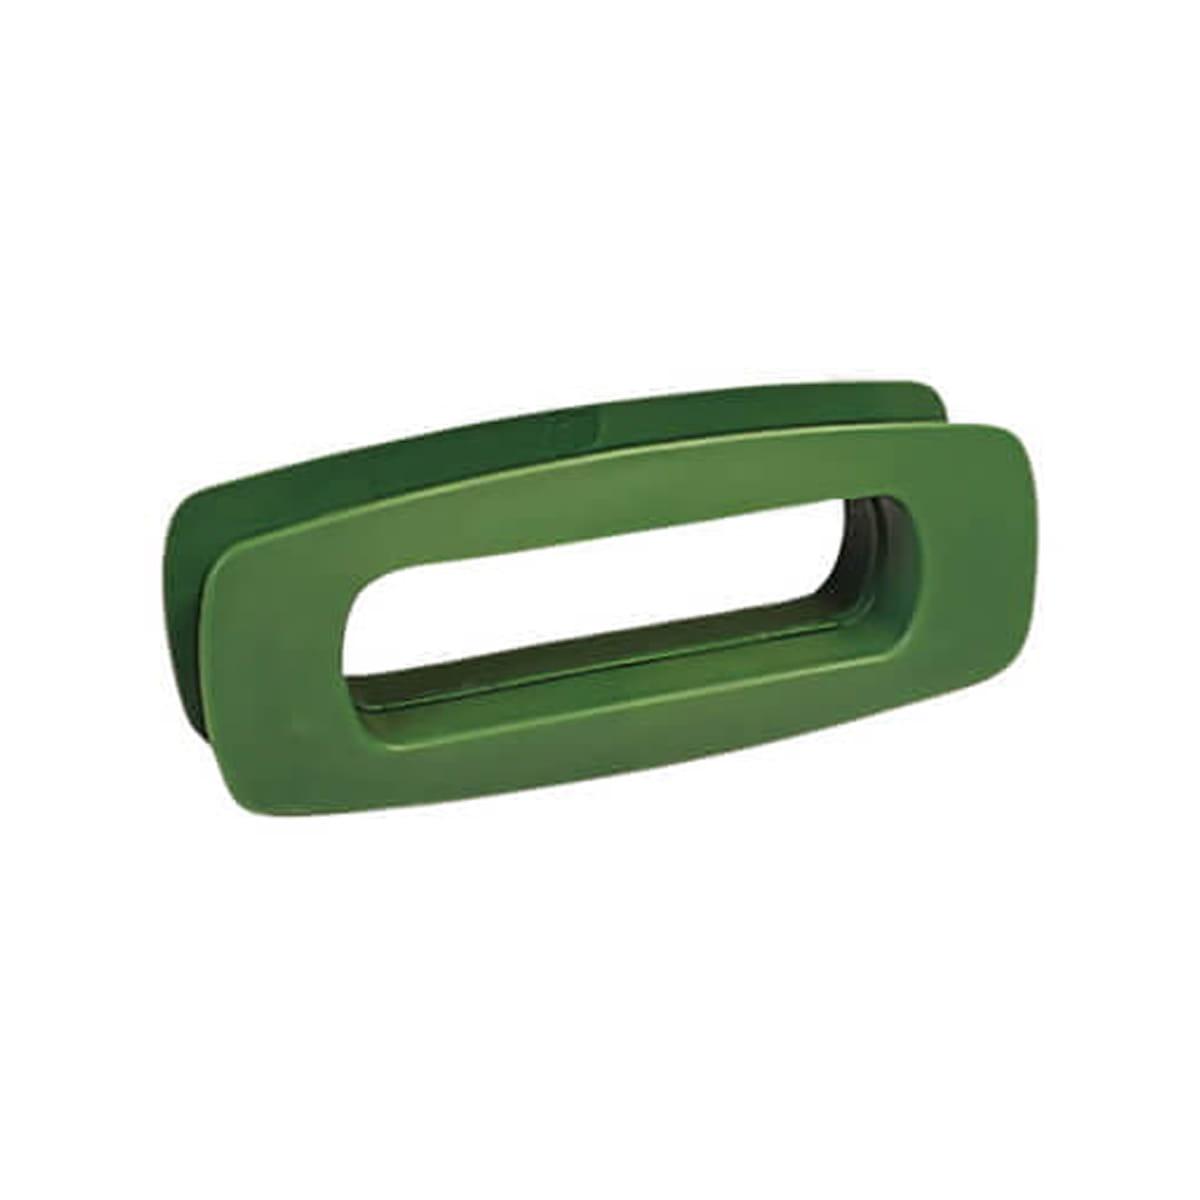 Asa verde rectangular para puertas de pvc